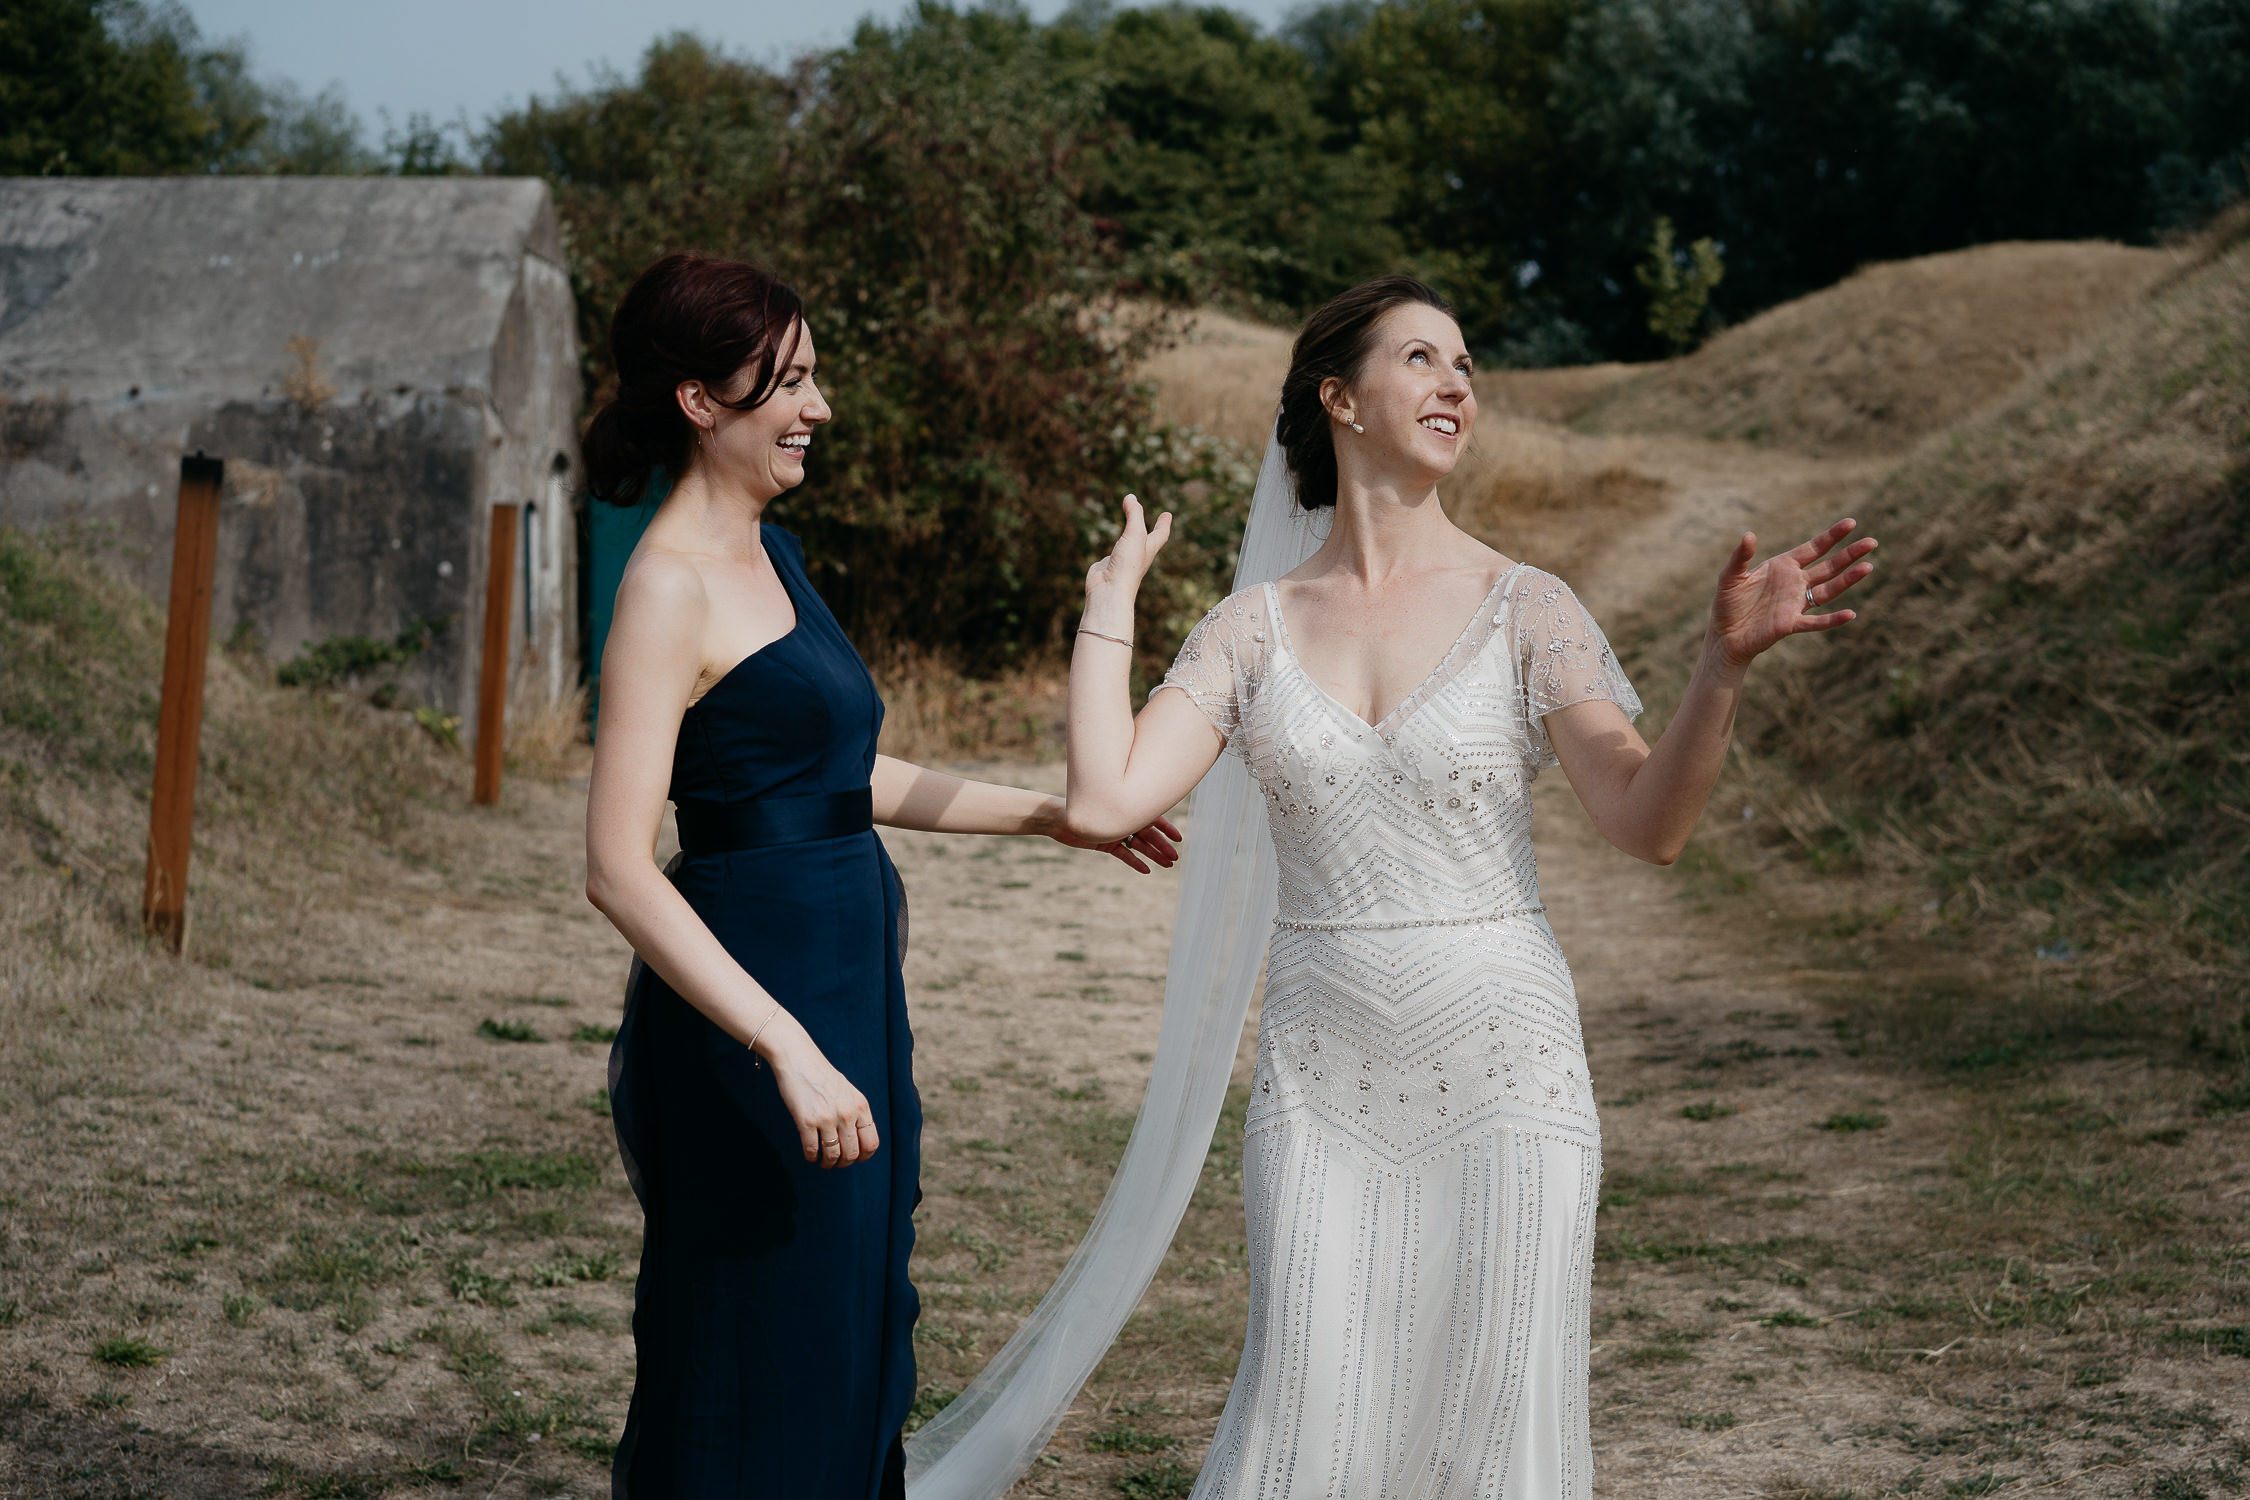 Wedding photoshoot by photographer mark hadden